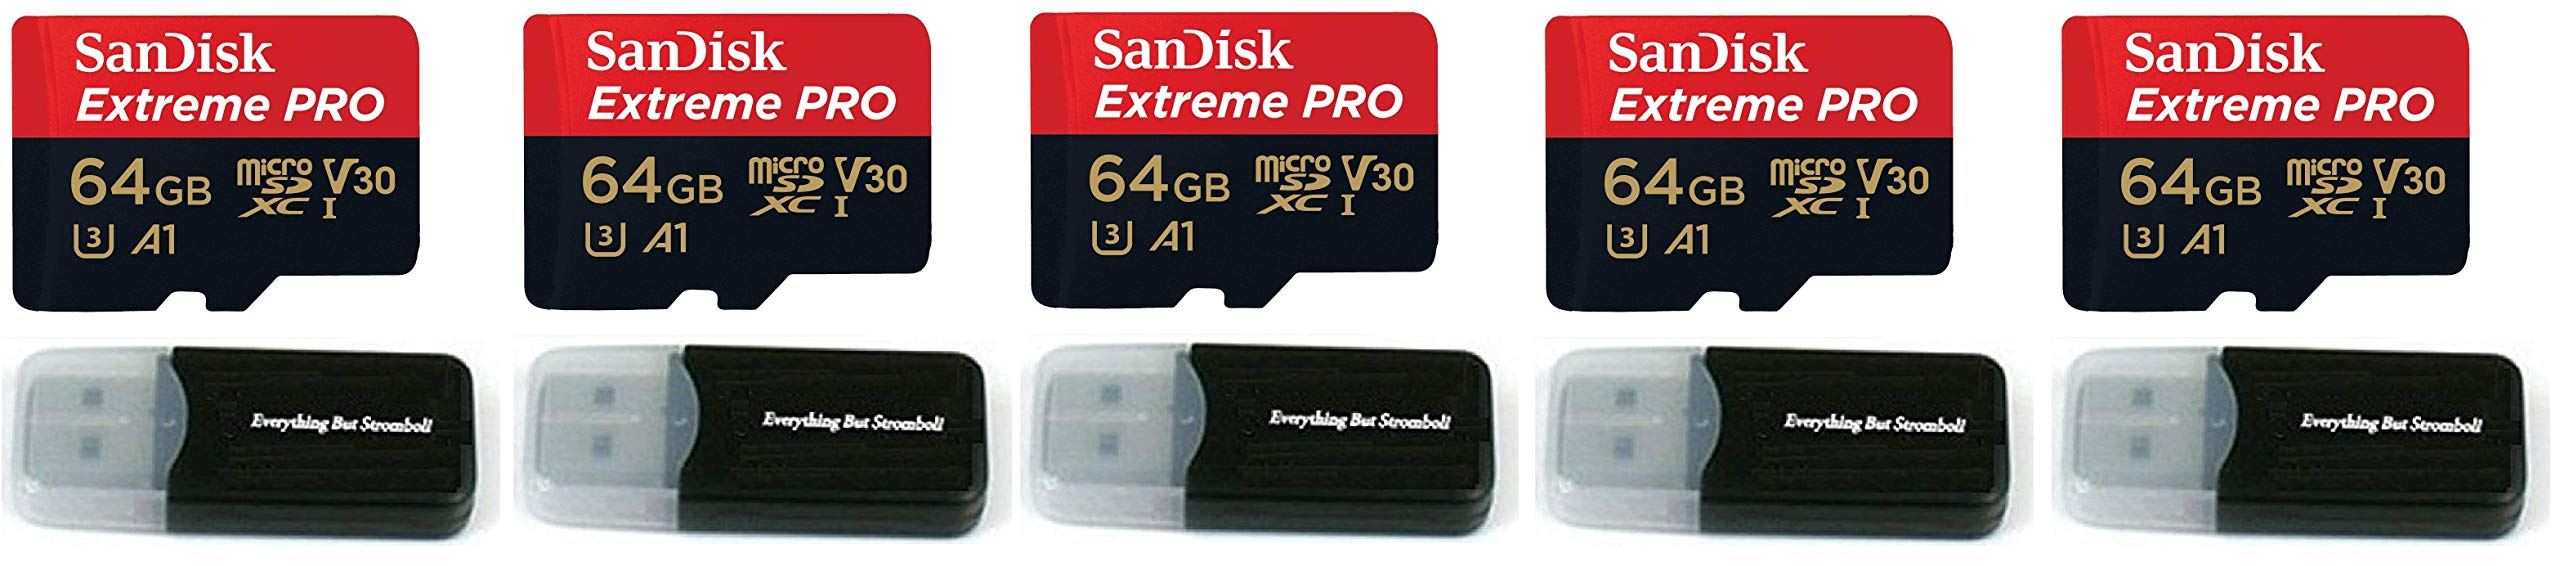 64GB Sandisk Extreme Pro 4K Memory Card for Gopro Hero 6, Fusion, Hero 5, Karma Drone, Hero 4, Session, Hero 3, 3+, Hero + Black - UHS-1 V30 64G Micro SDXC (5-(Pack))